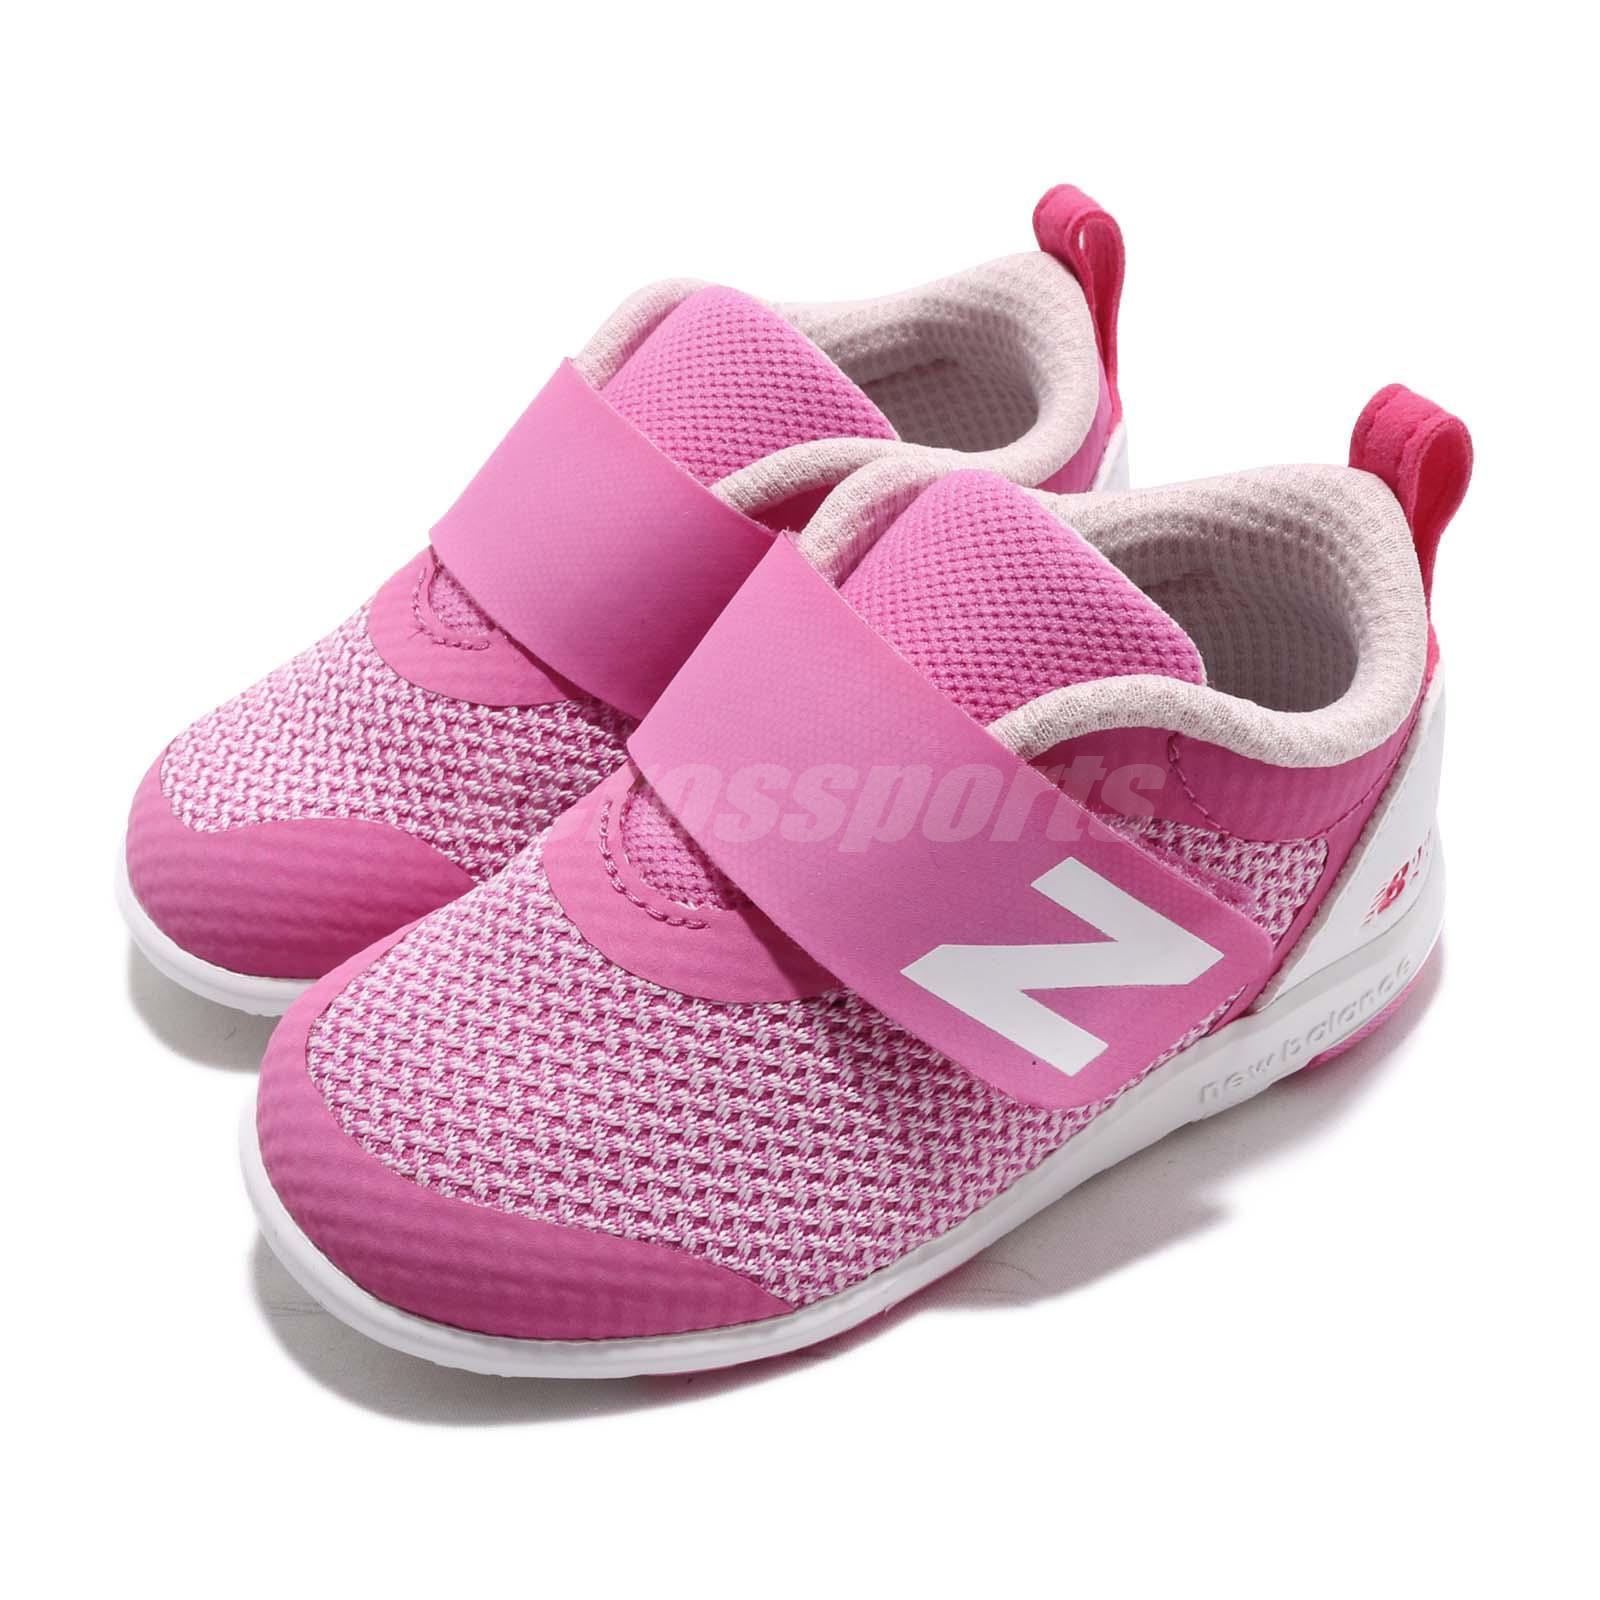 New Balance IO223MGT W Wide Pink White